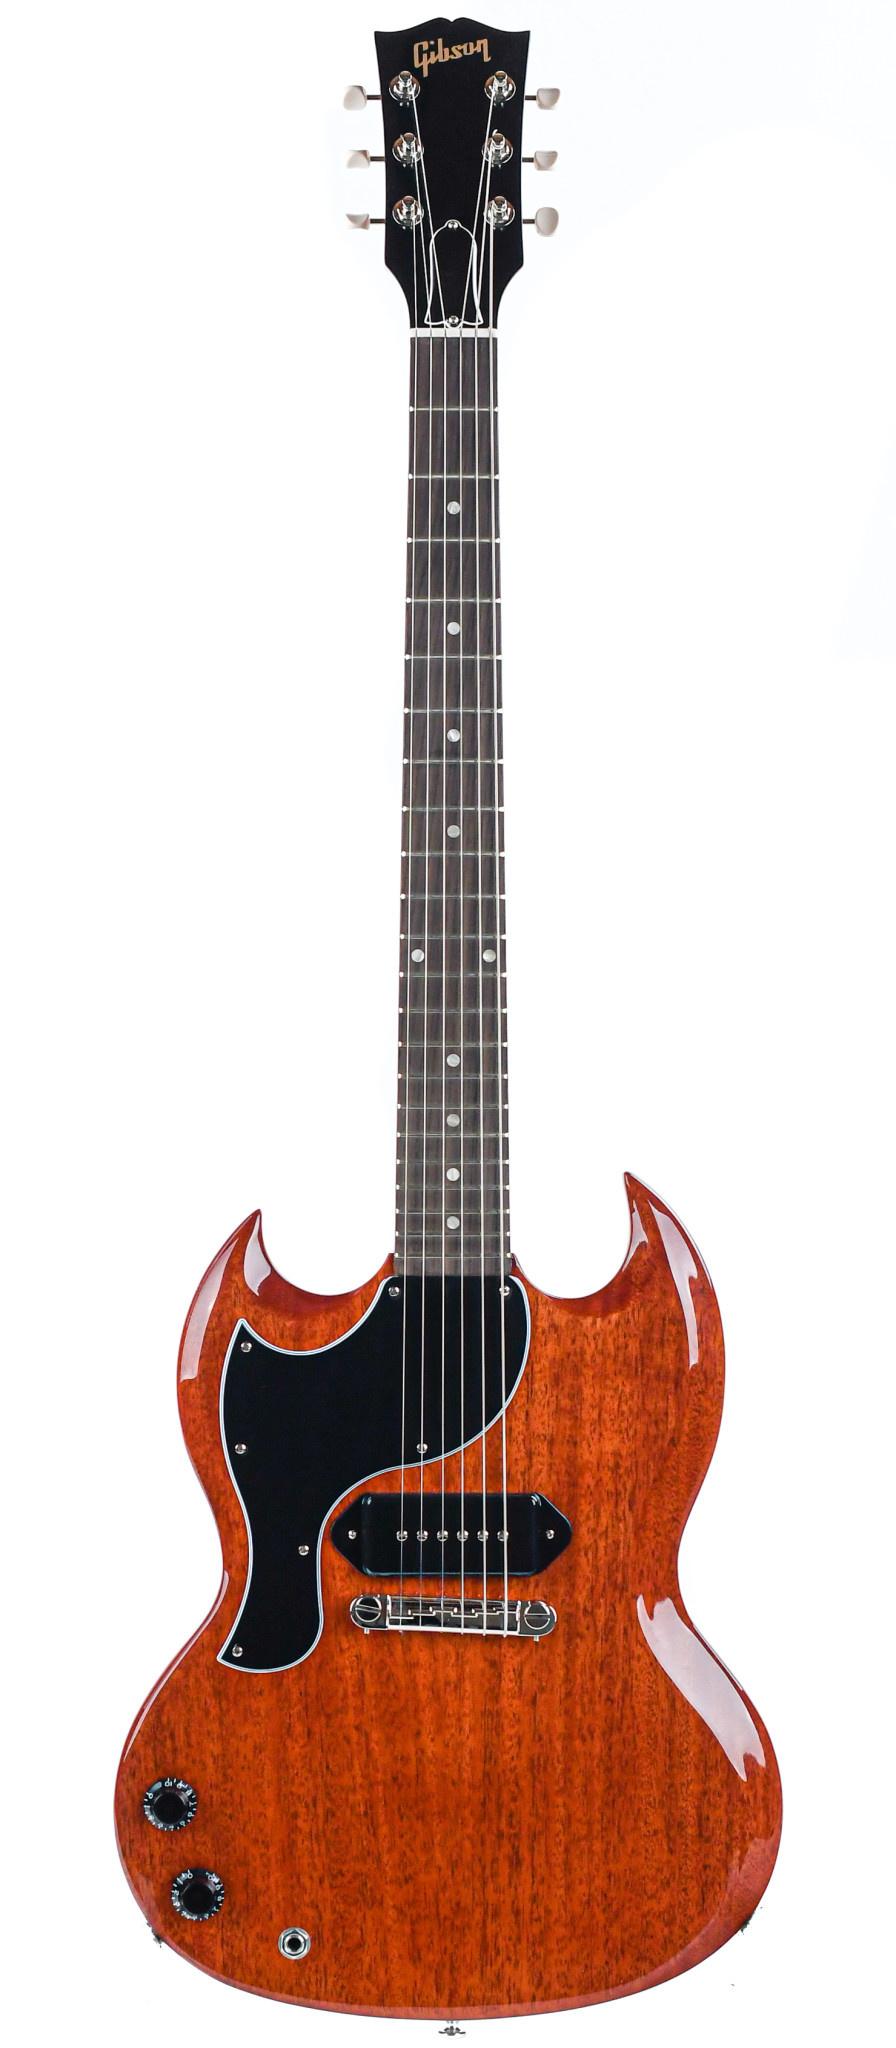 Gibson SG Junior Vintage Cherry Lefty